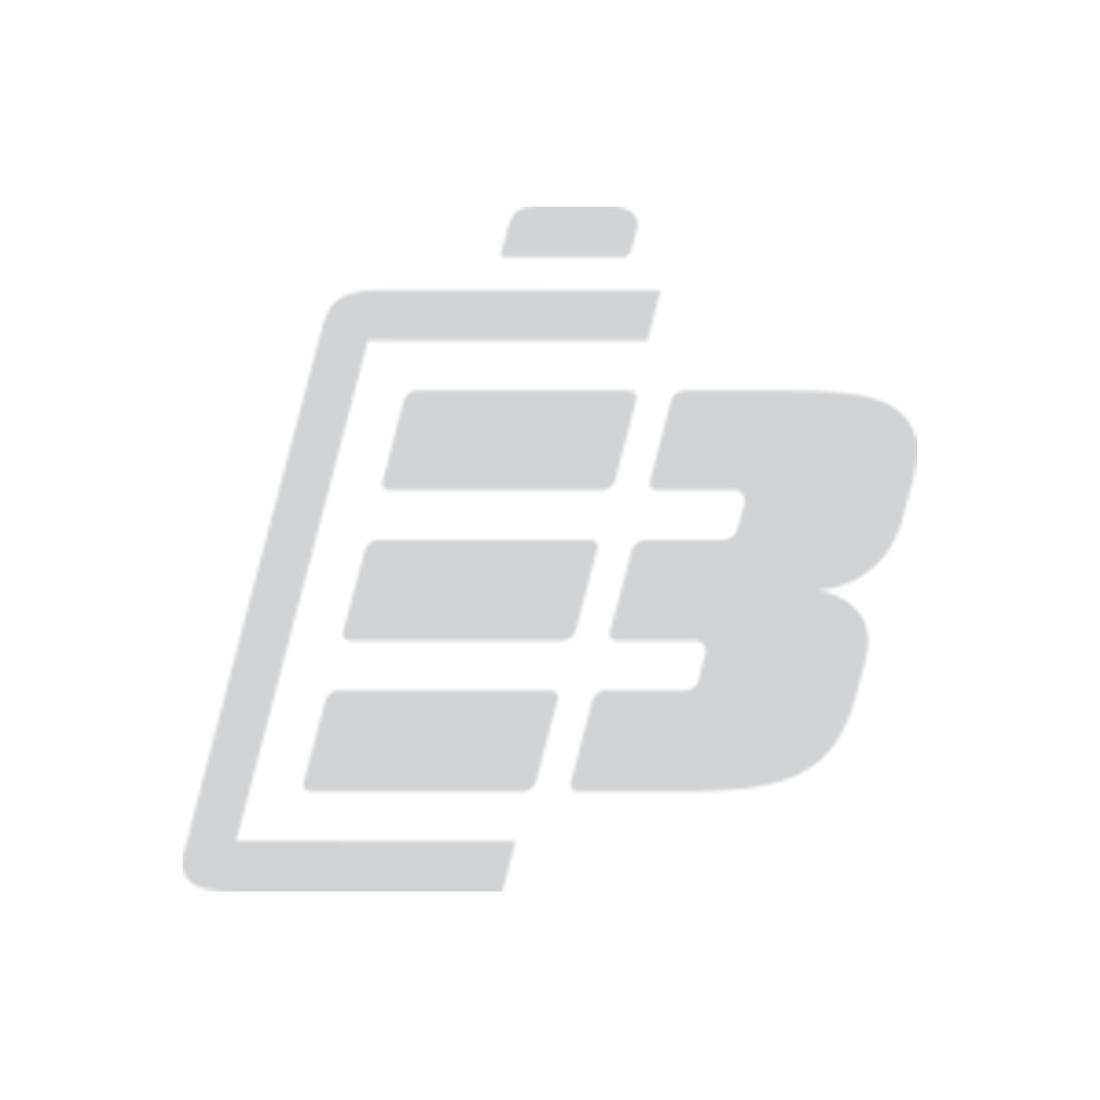 Smartphone battery Xiaomi Pocophone Poco F1_1